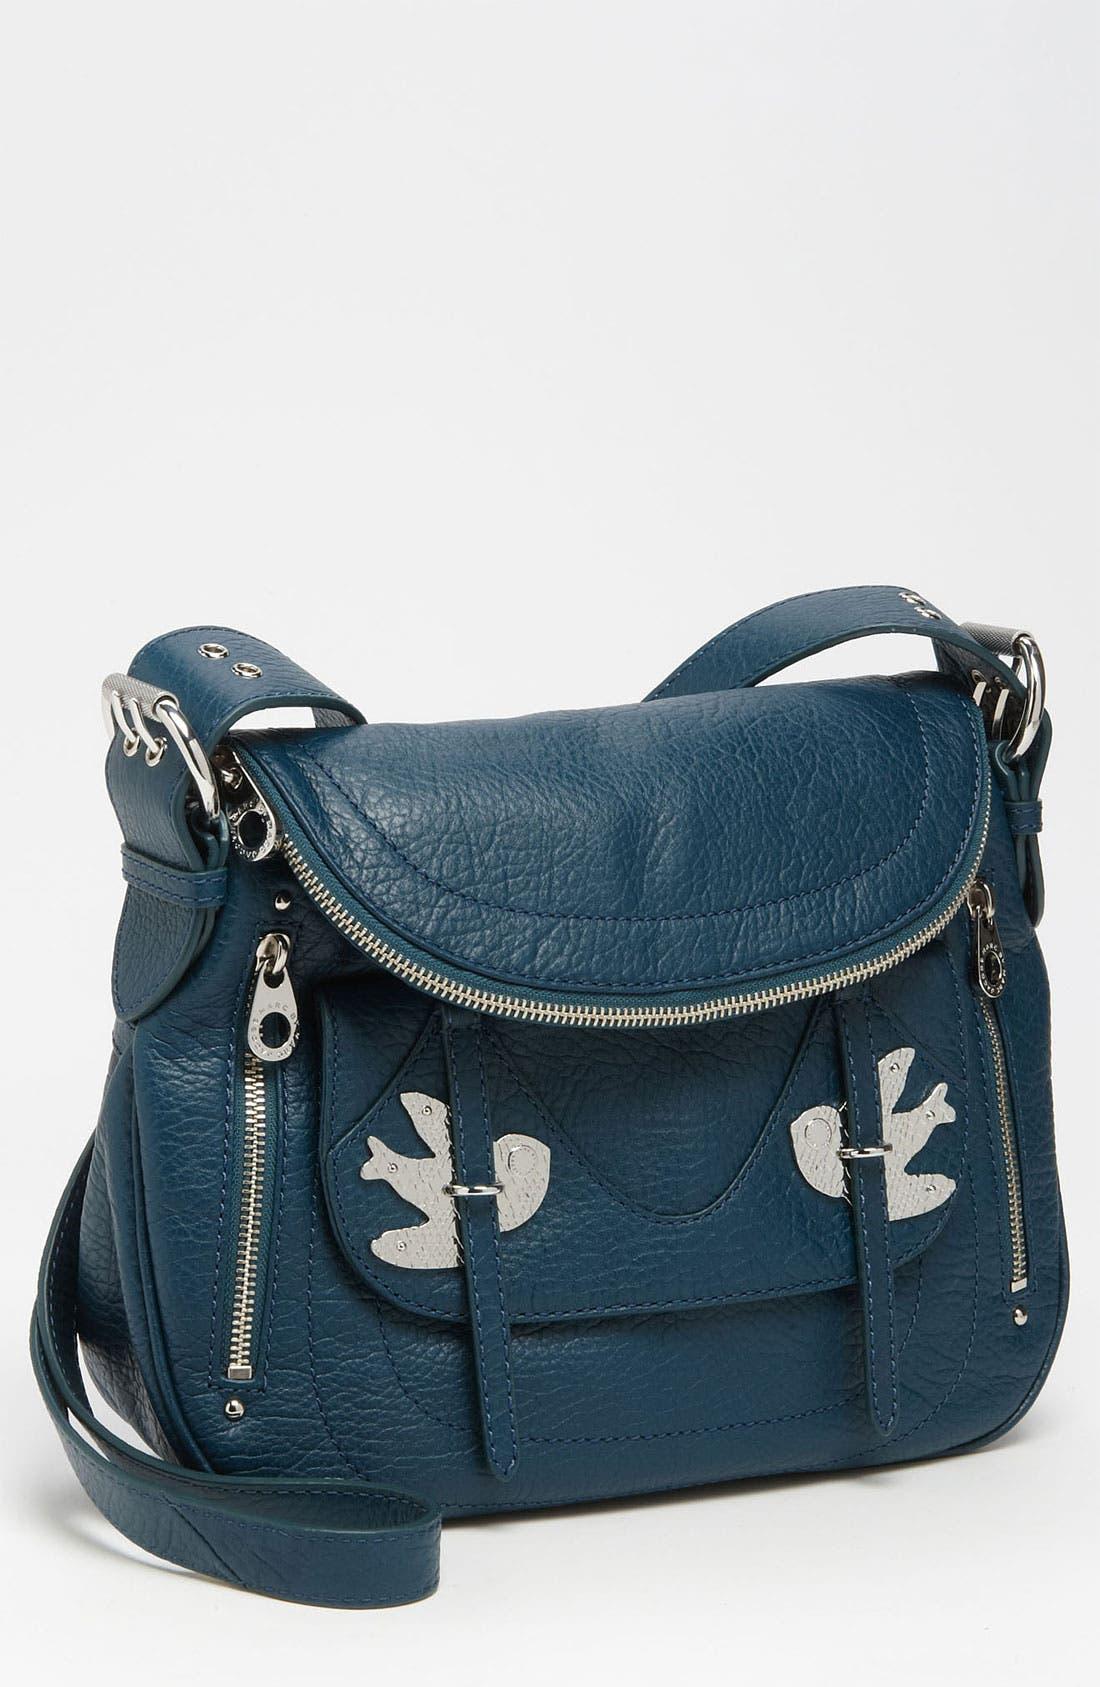 Alternate Image 1 Selected - MARC BY MARC JACOBS 'P2M Natasha' Crossbody Bag